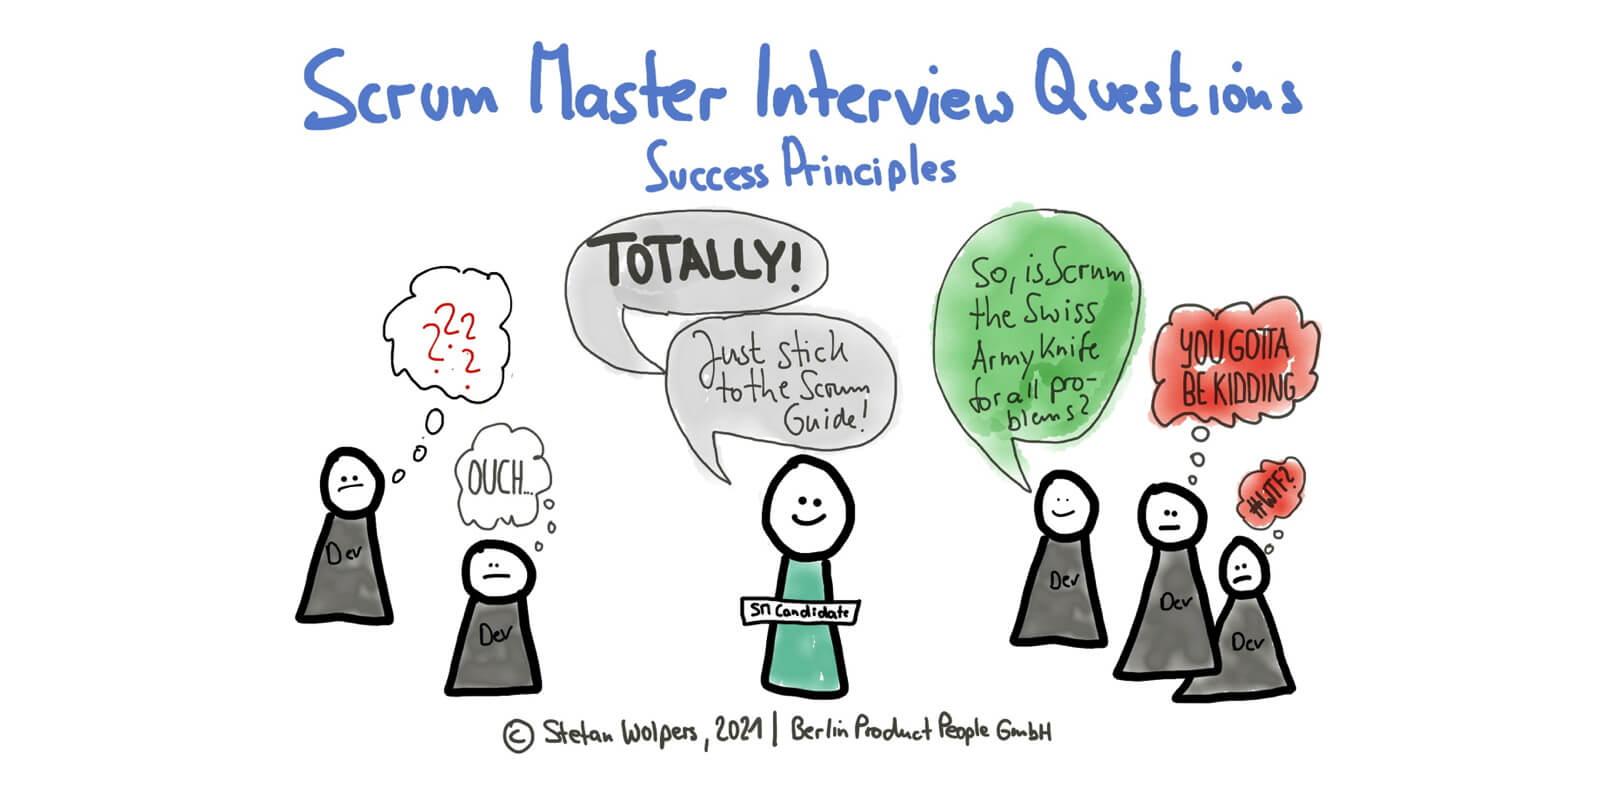 Scrum Success Principles and Indicators — 51 Scrum Master Interview Questions (5)